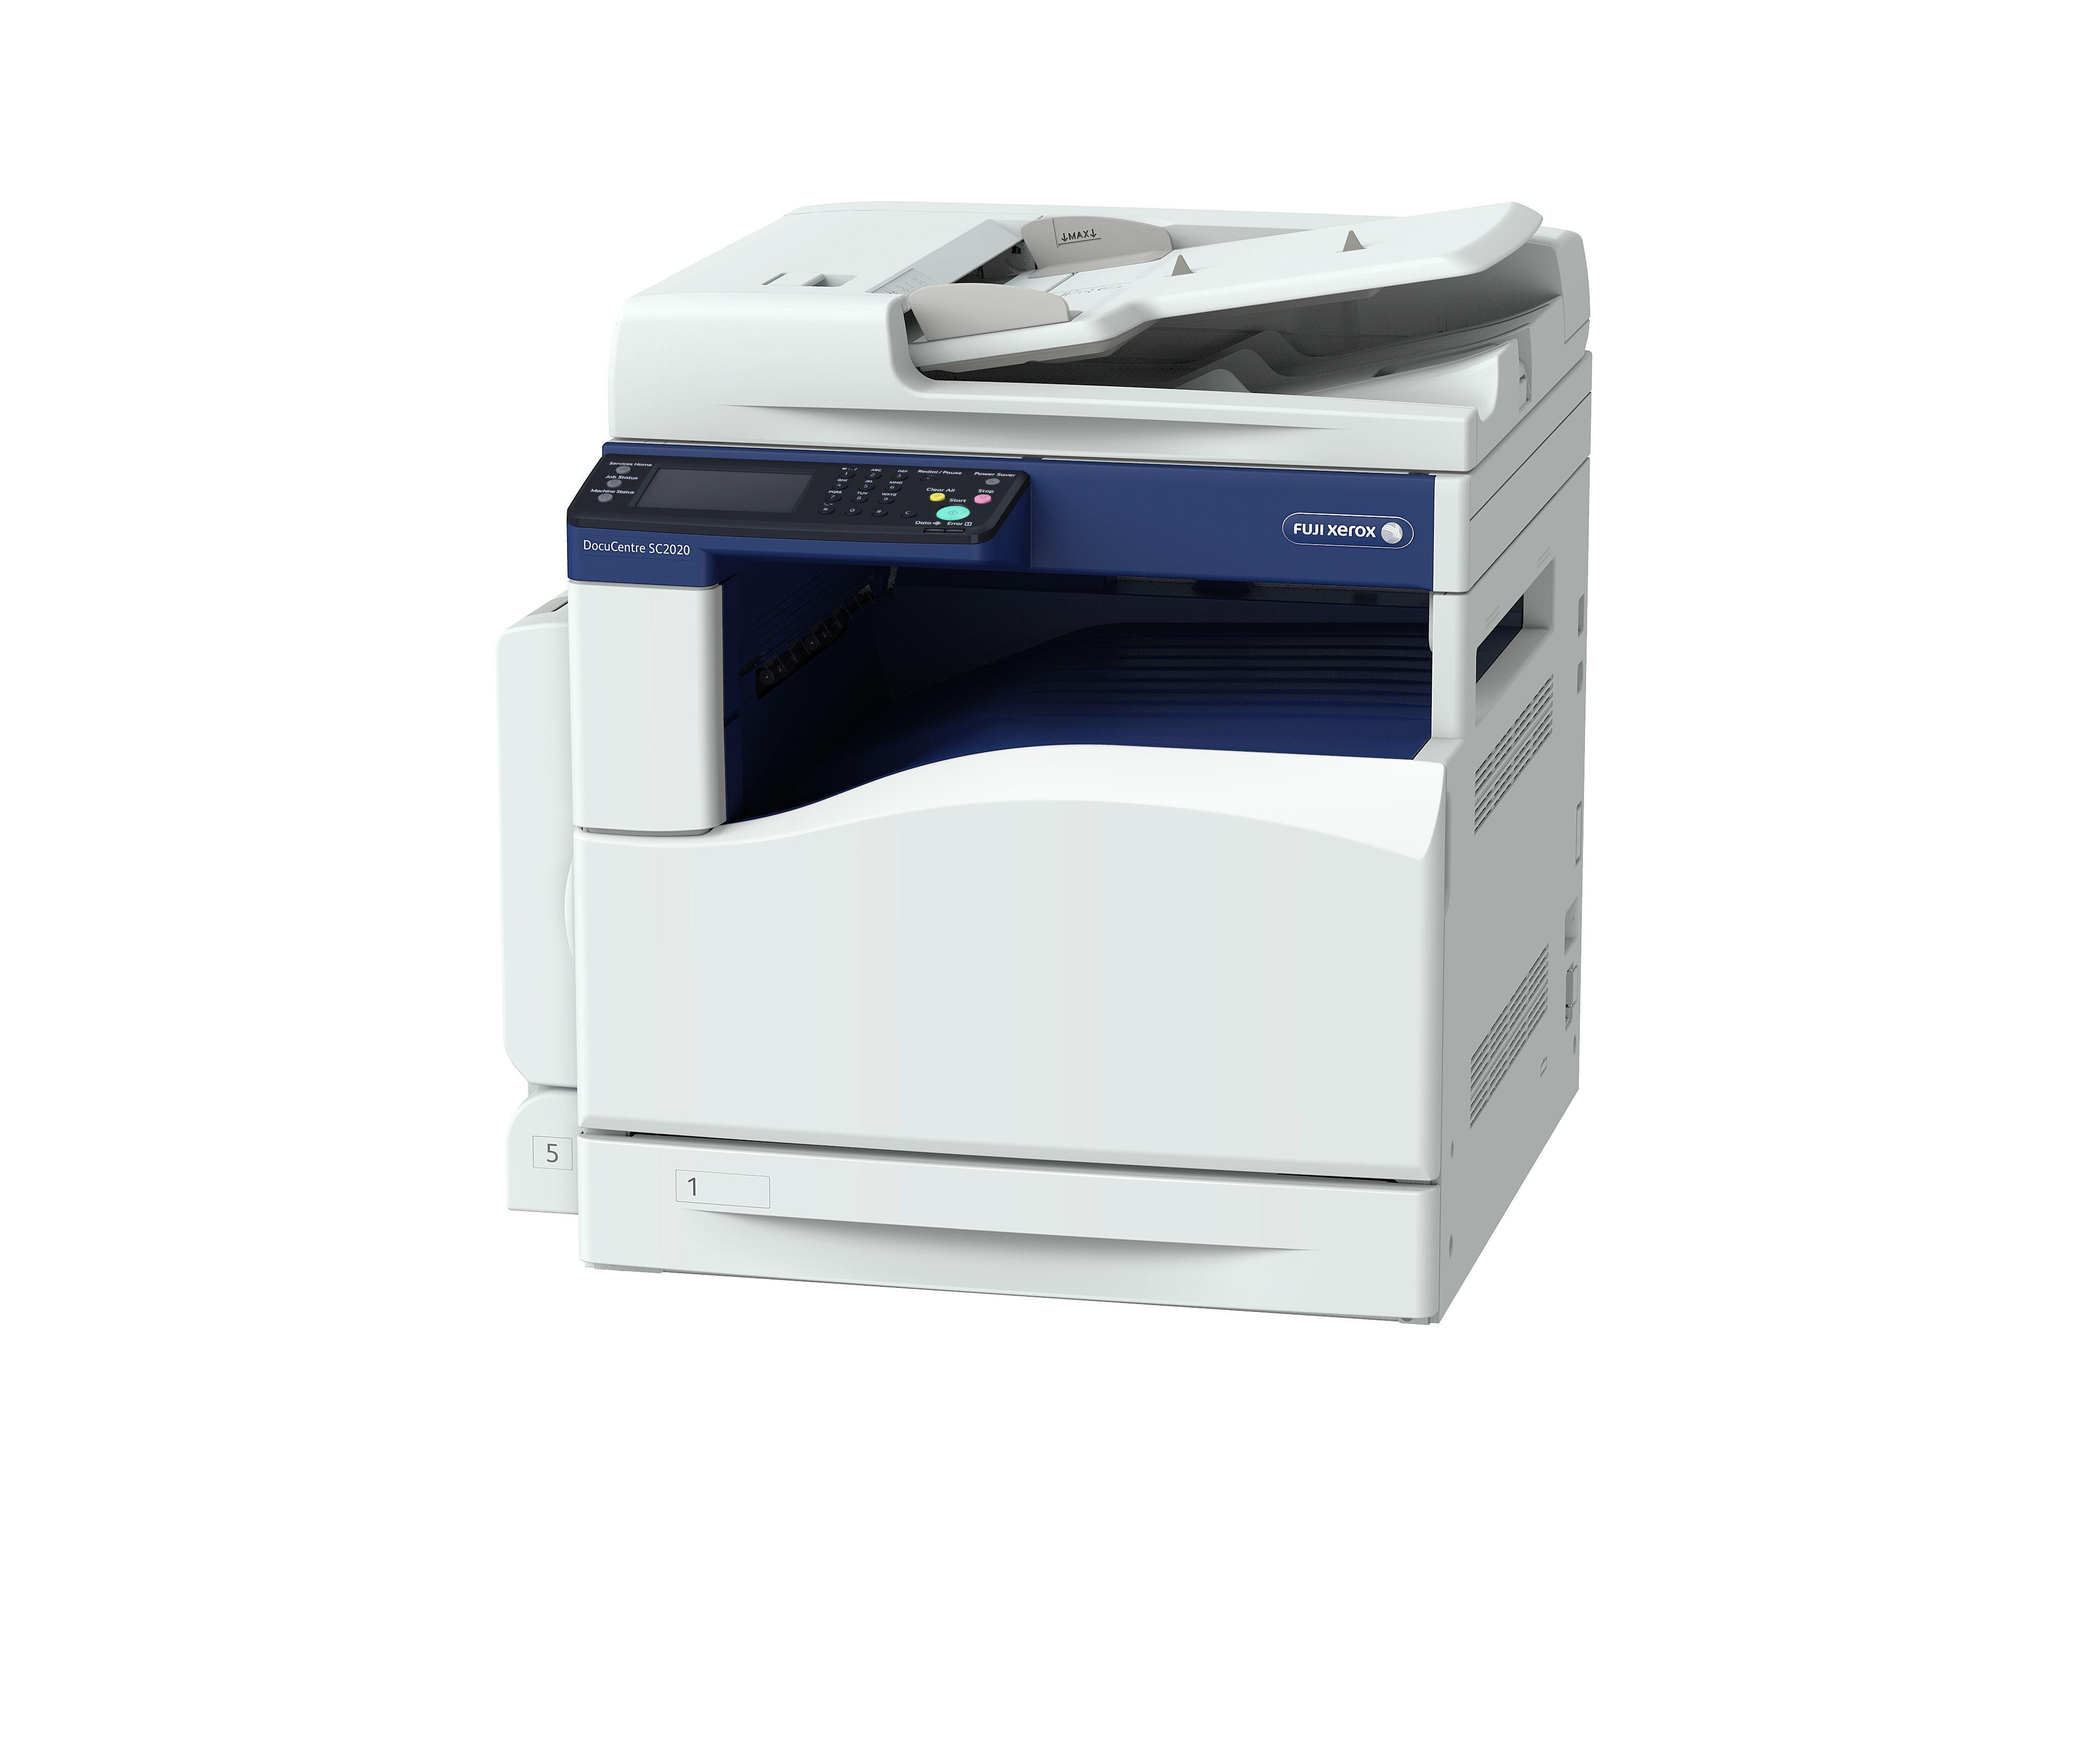 Mesin Fotocopy A3 Fuji Xerox Docucentre Sc2020 Warna Warna